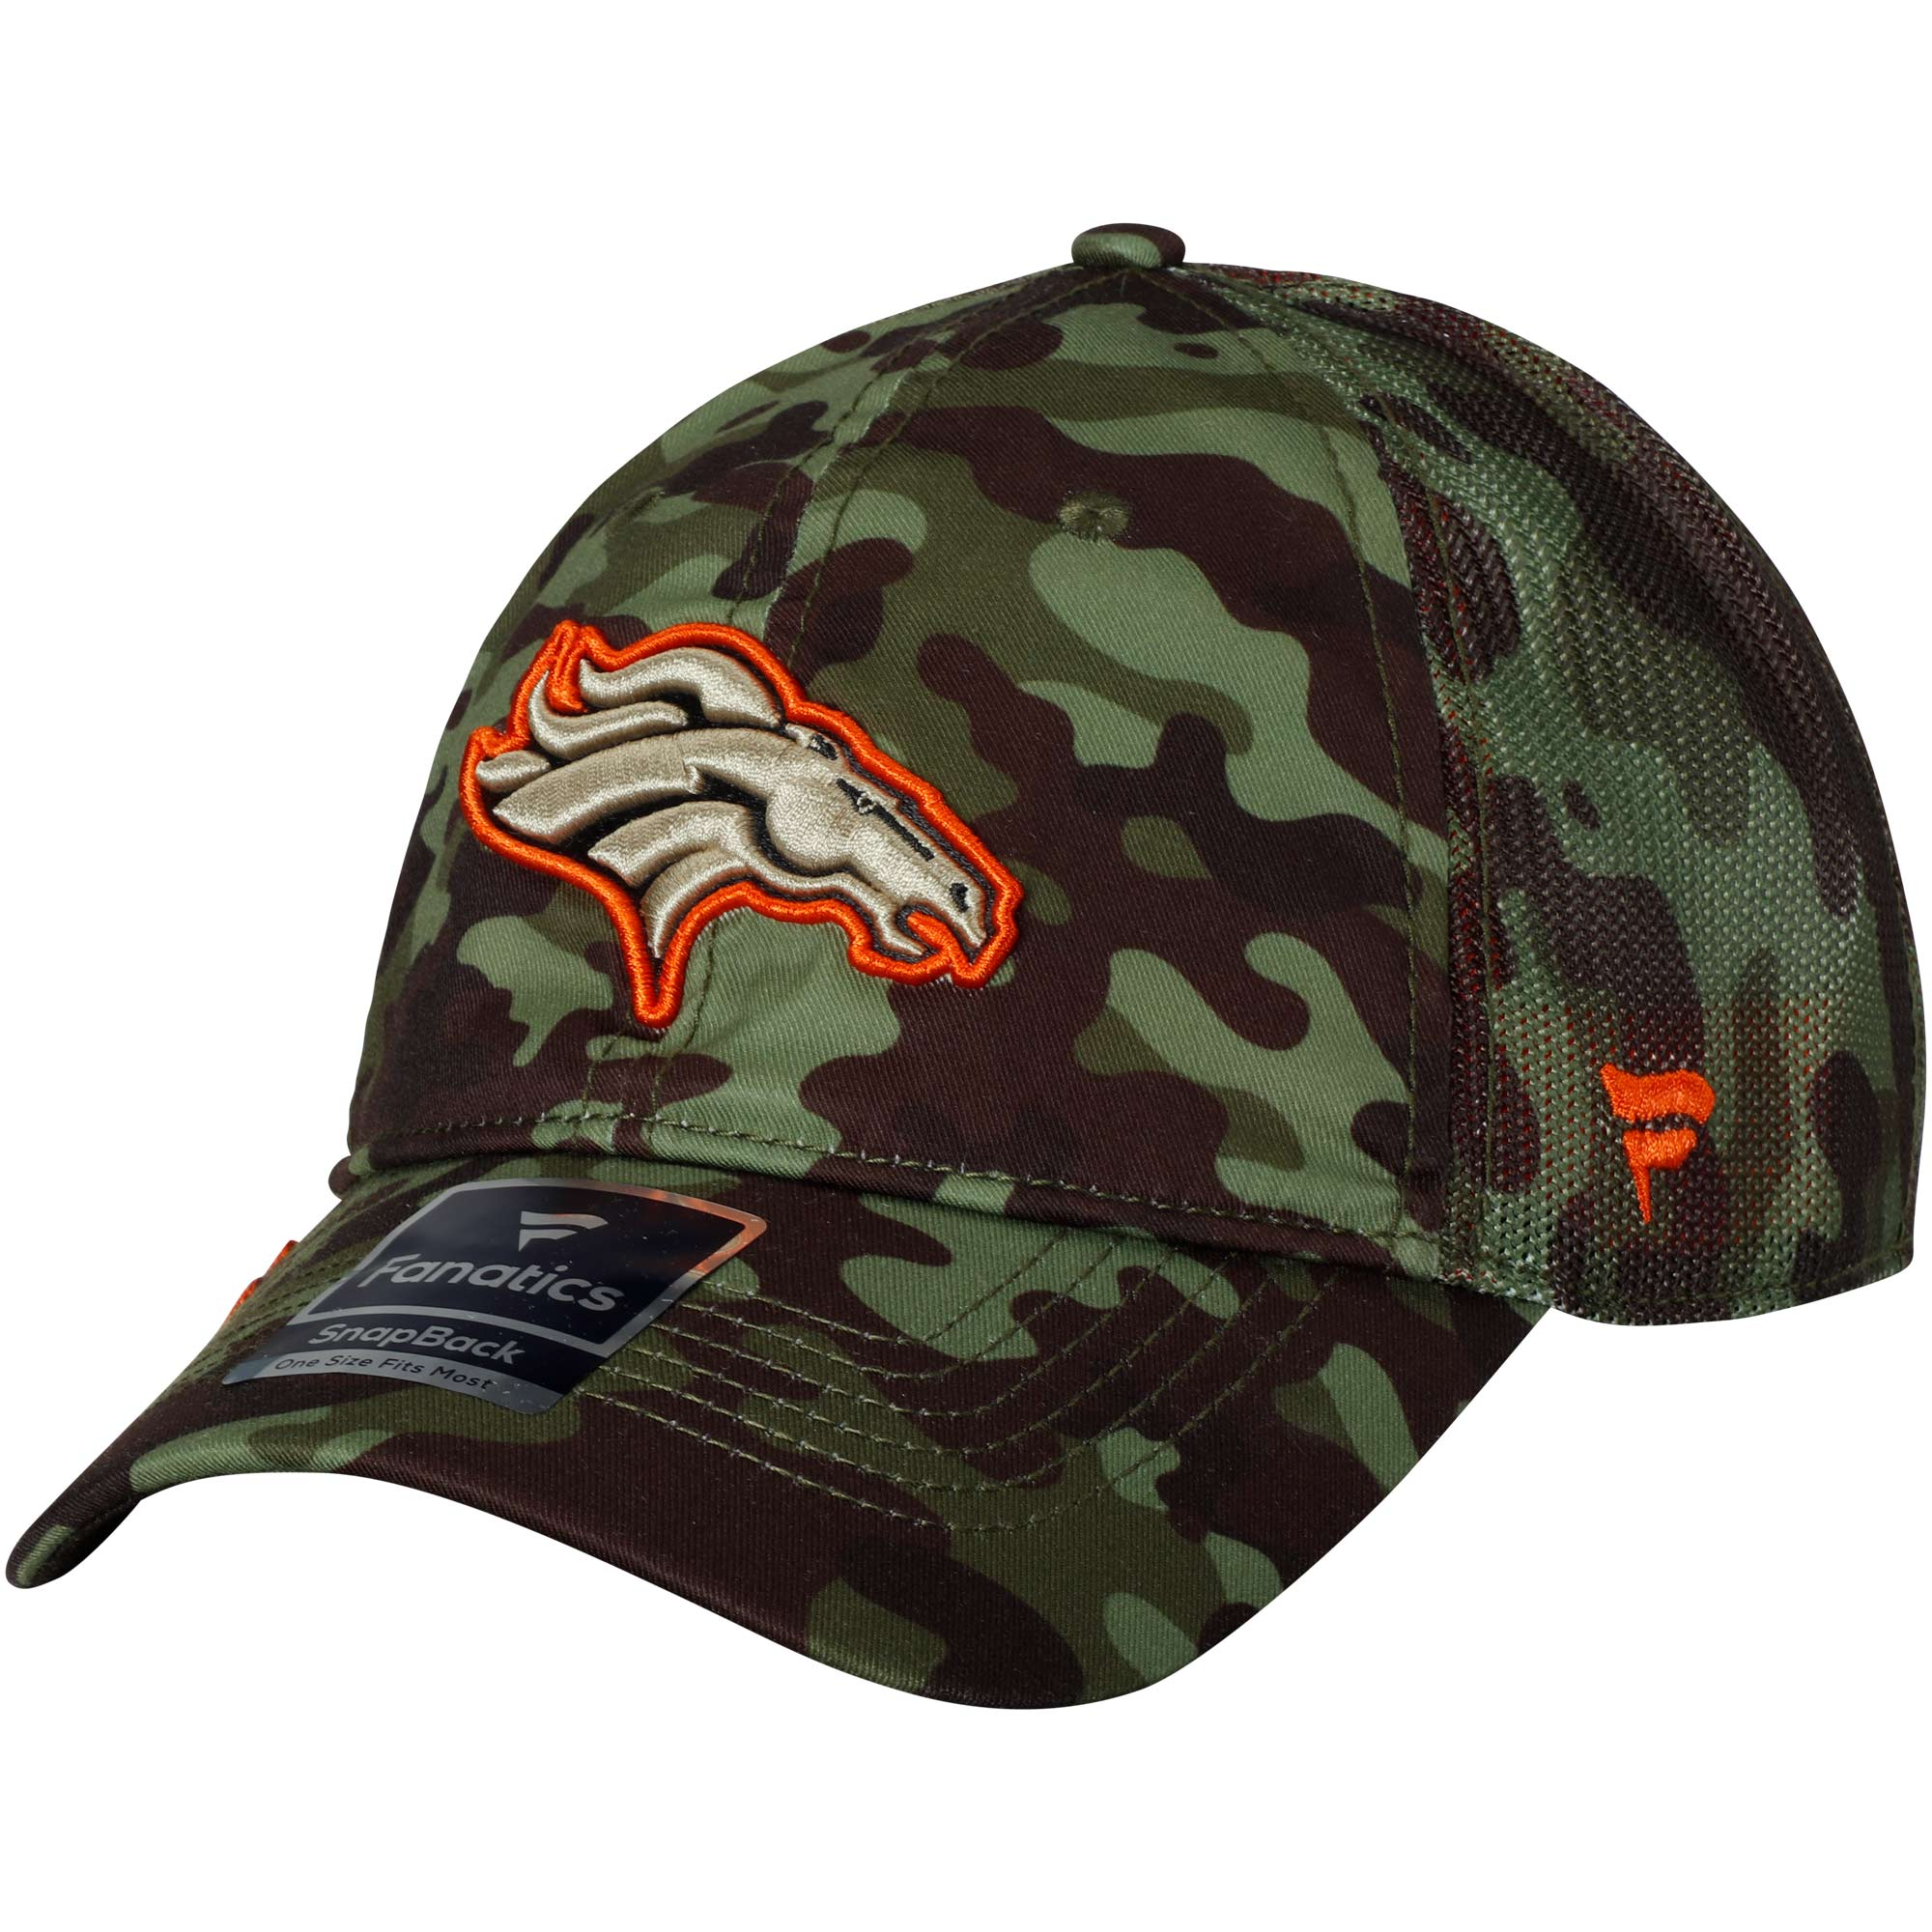 Denver Broncos NFL Pro Line by Fanatics Branded Recon Trucker Adjustable Hat - Camo